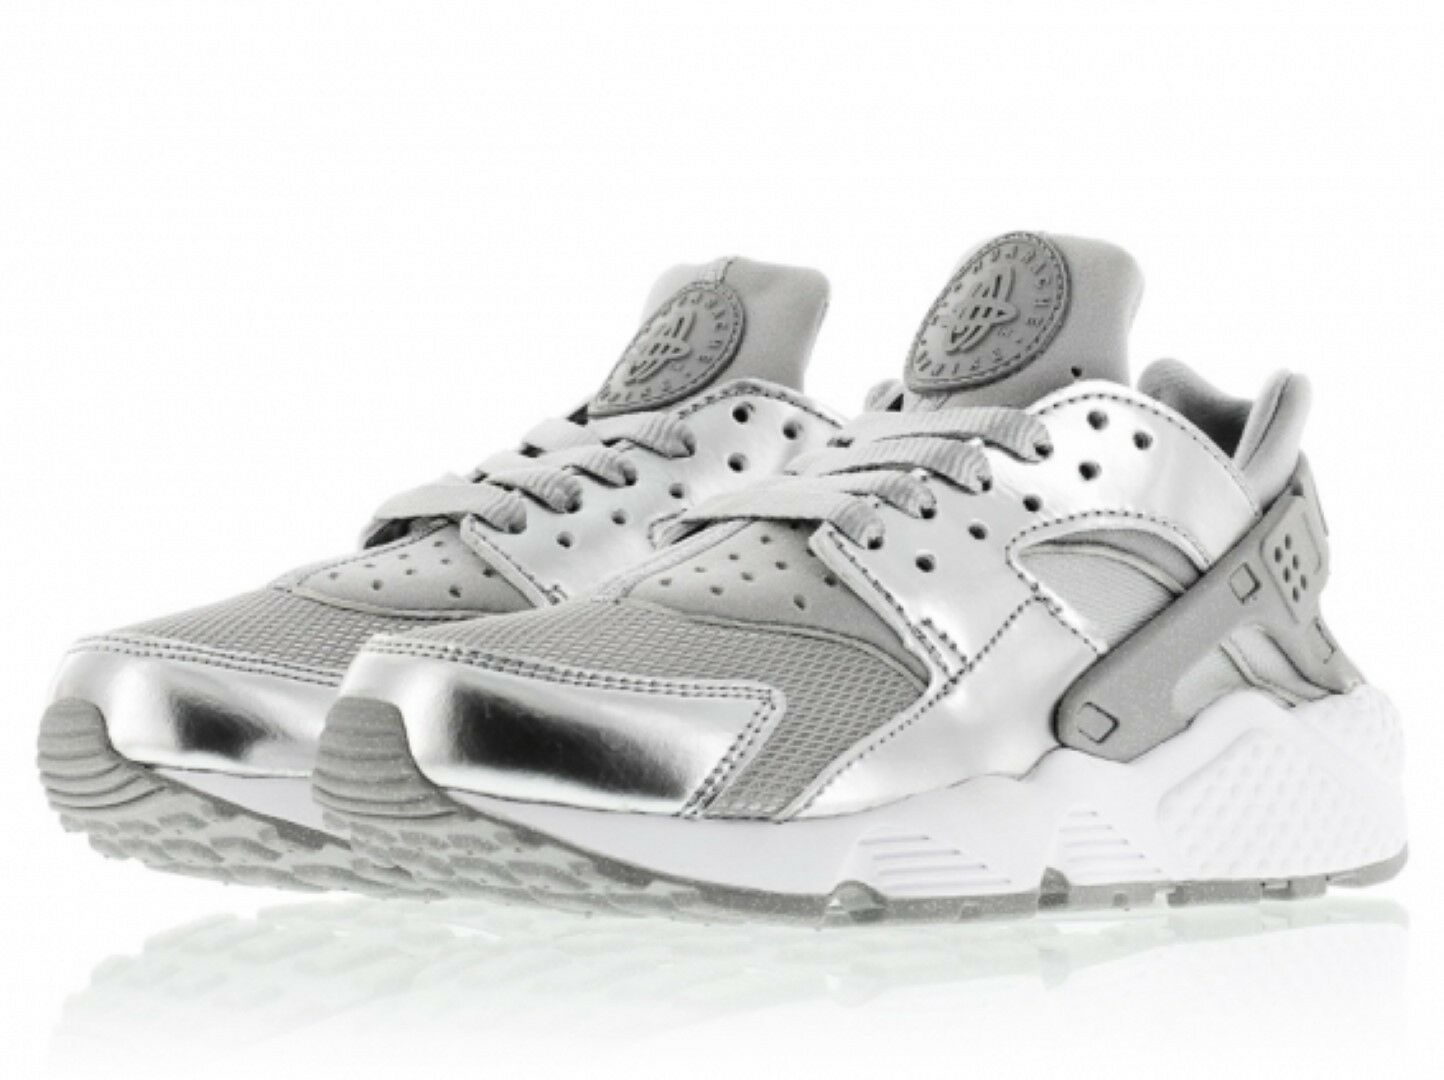 Nike Air Huarache Premium in Pelle NUOVE Scarpe Da Ginnastica Sneaker In Argento 693818 001